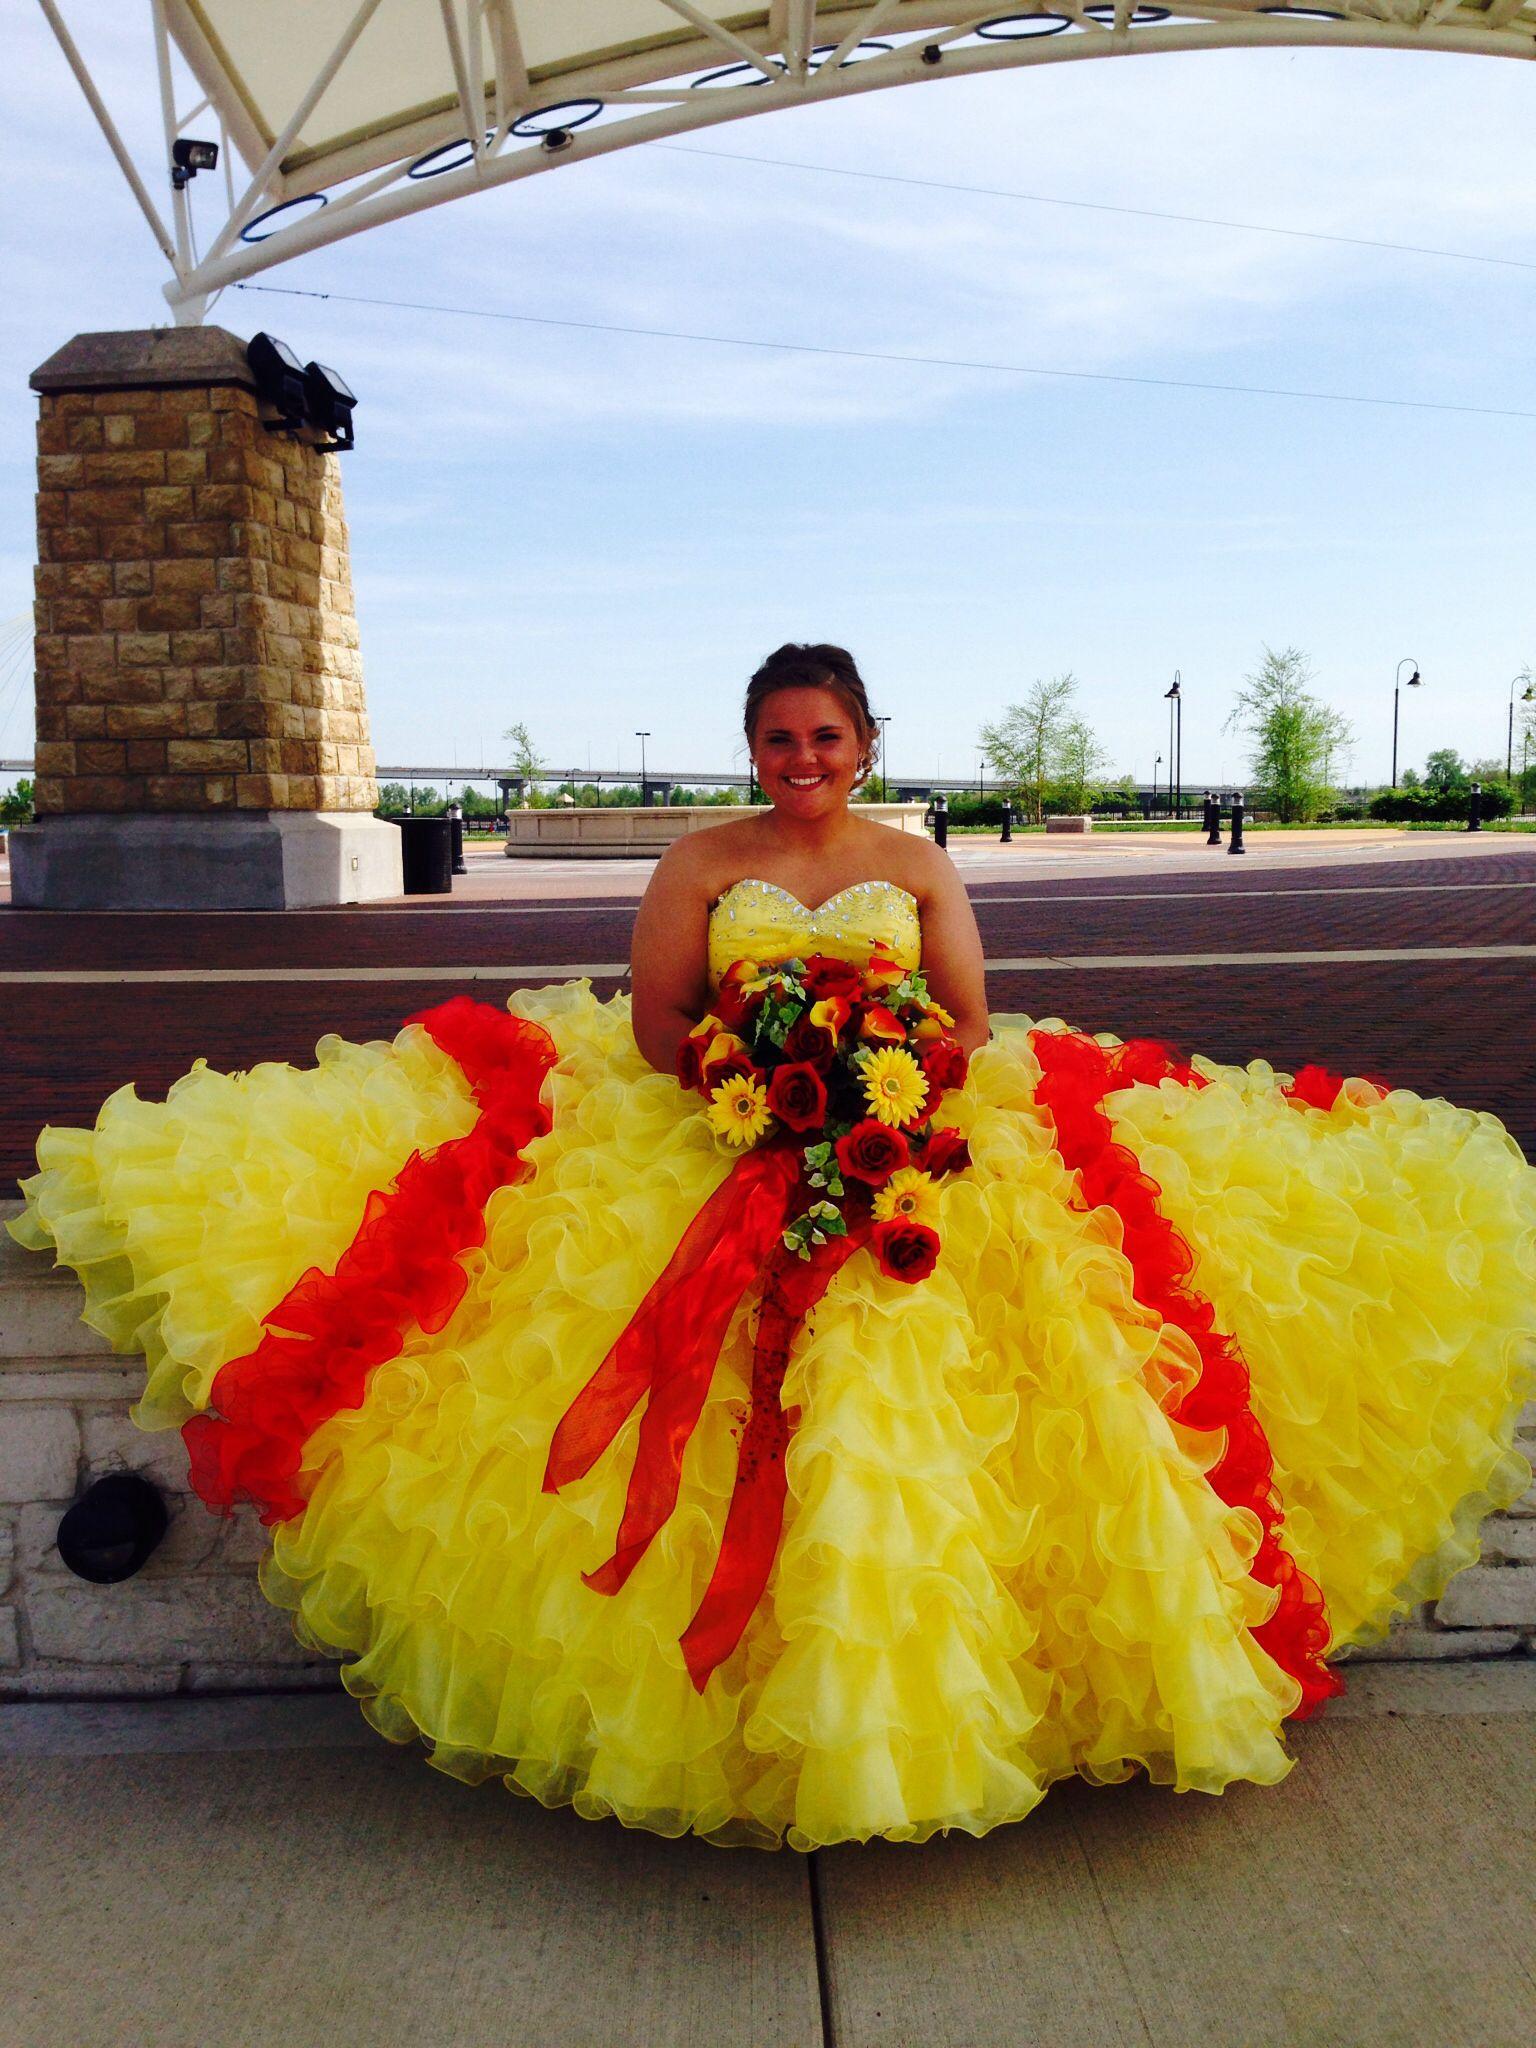 Softball prom dress softball prom dress pinterest for Peacock feather wedding dress vera wang 2009